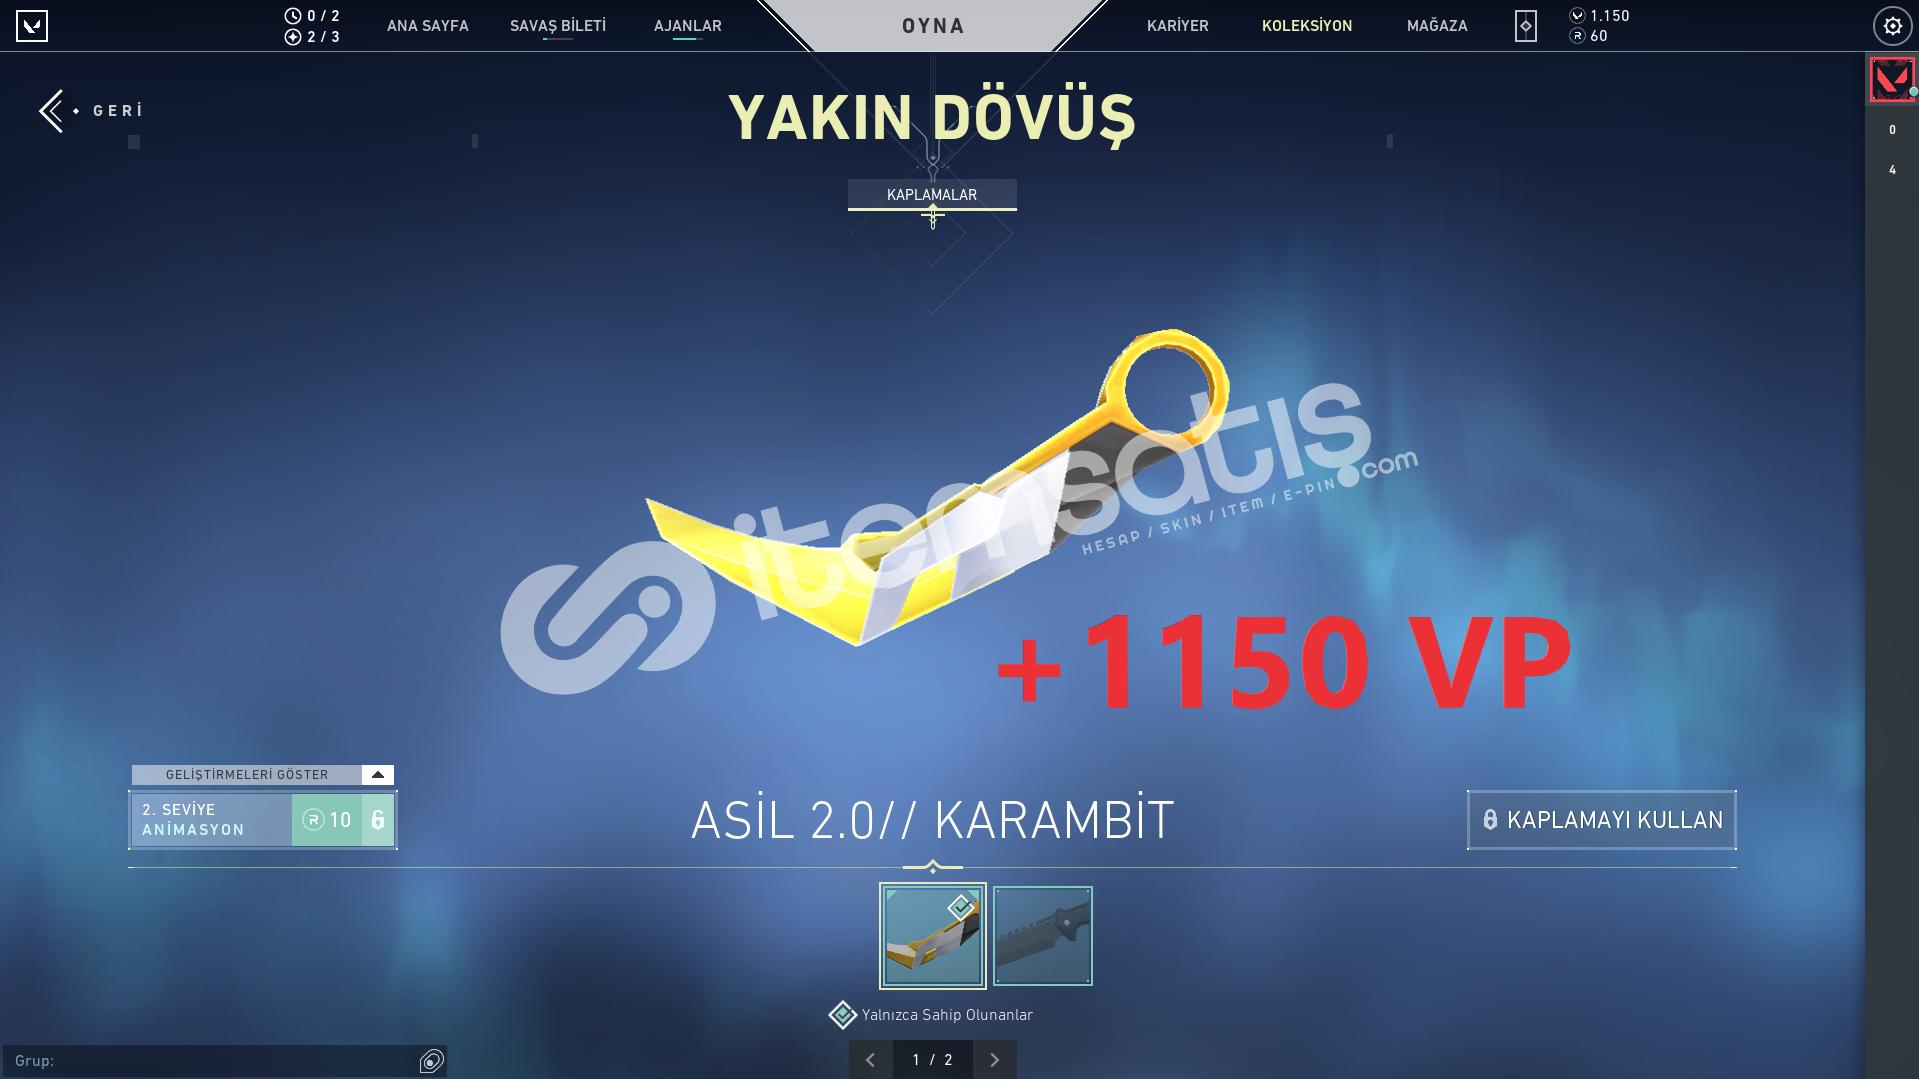 ASİL KARAMBİT+1150VP GOLD 2 HESAP